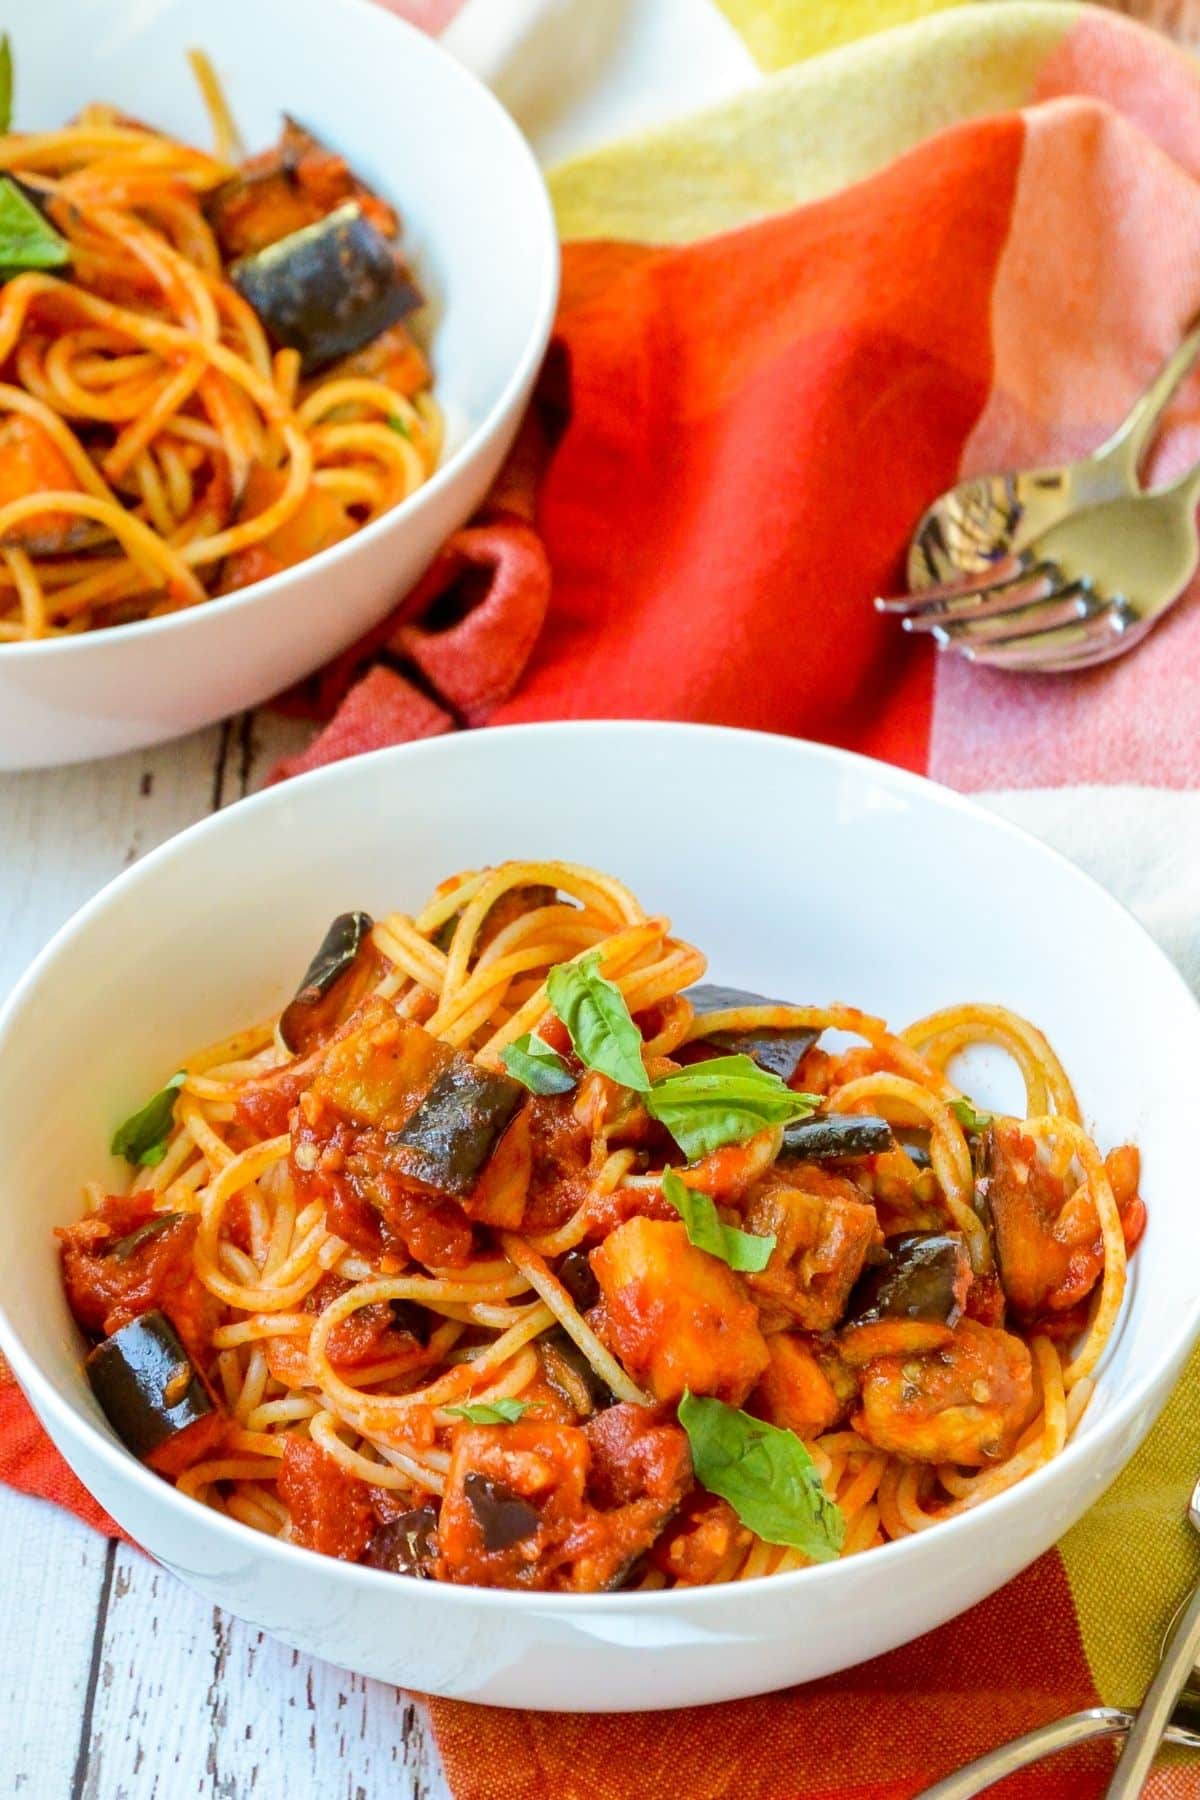 Bowls of pasta